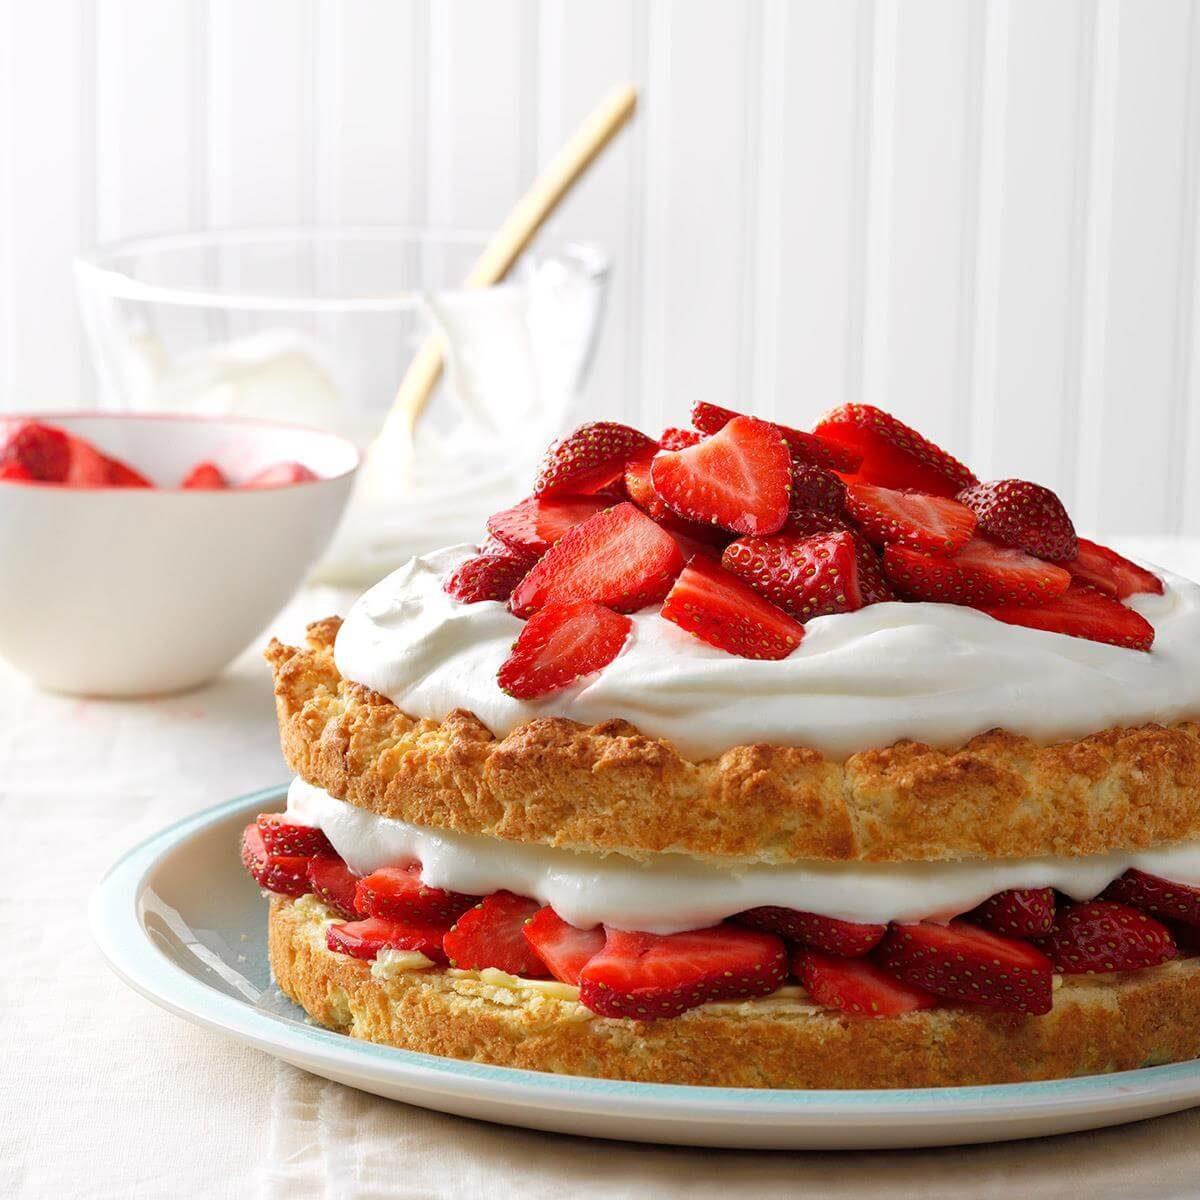 Grandma's Strawberry Shortcake Recipe